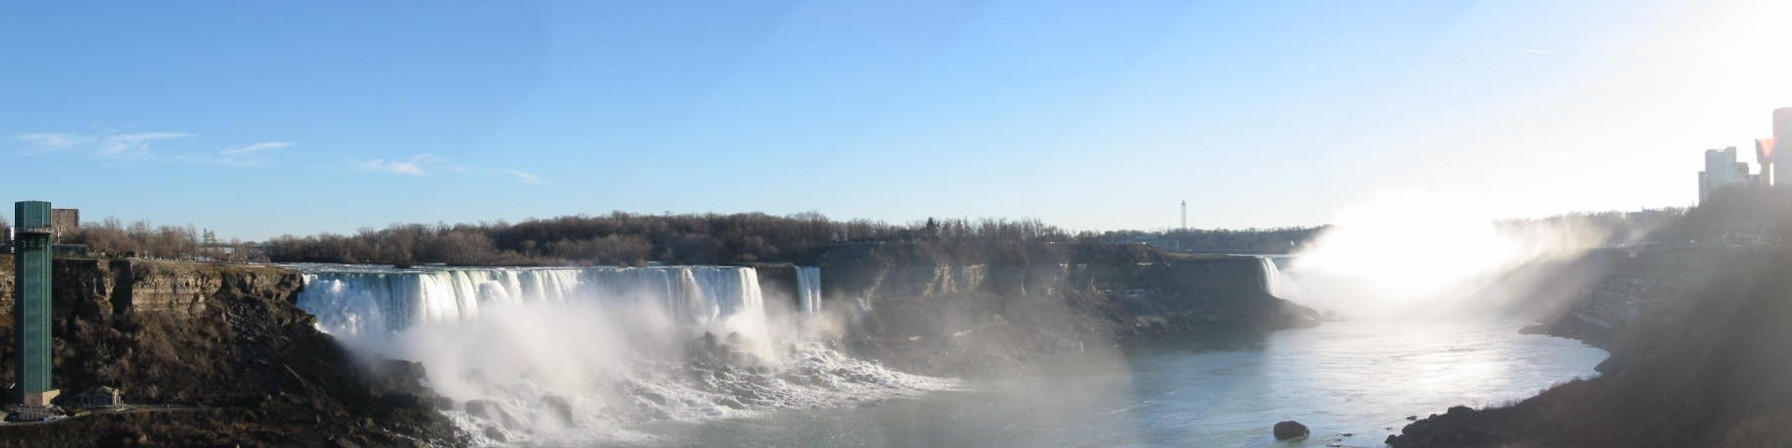 Niagara falls panoramic view by Sunstars